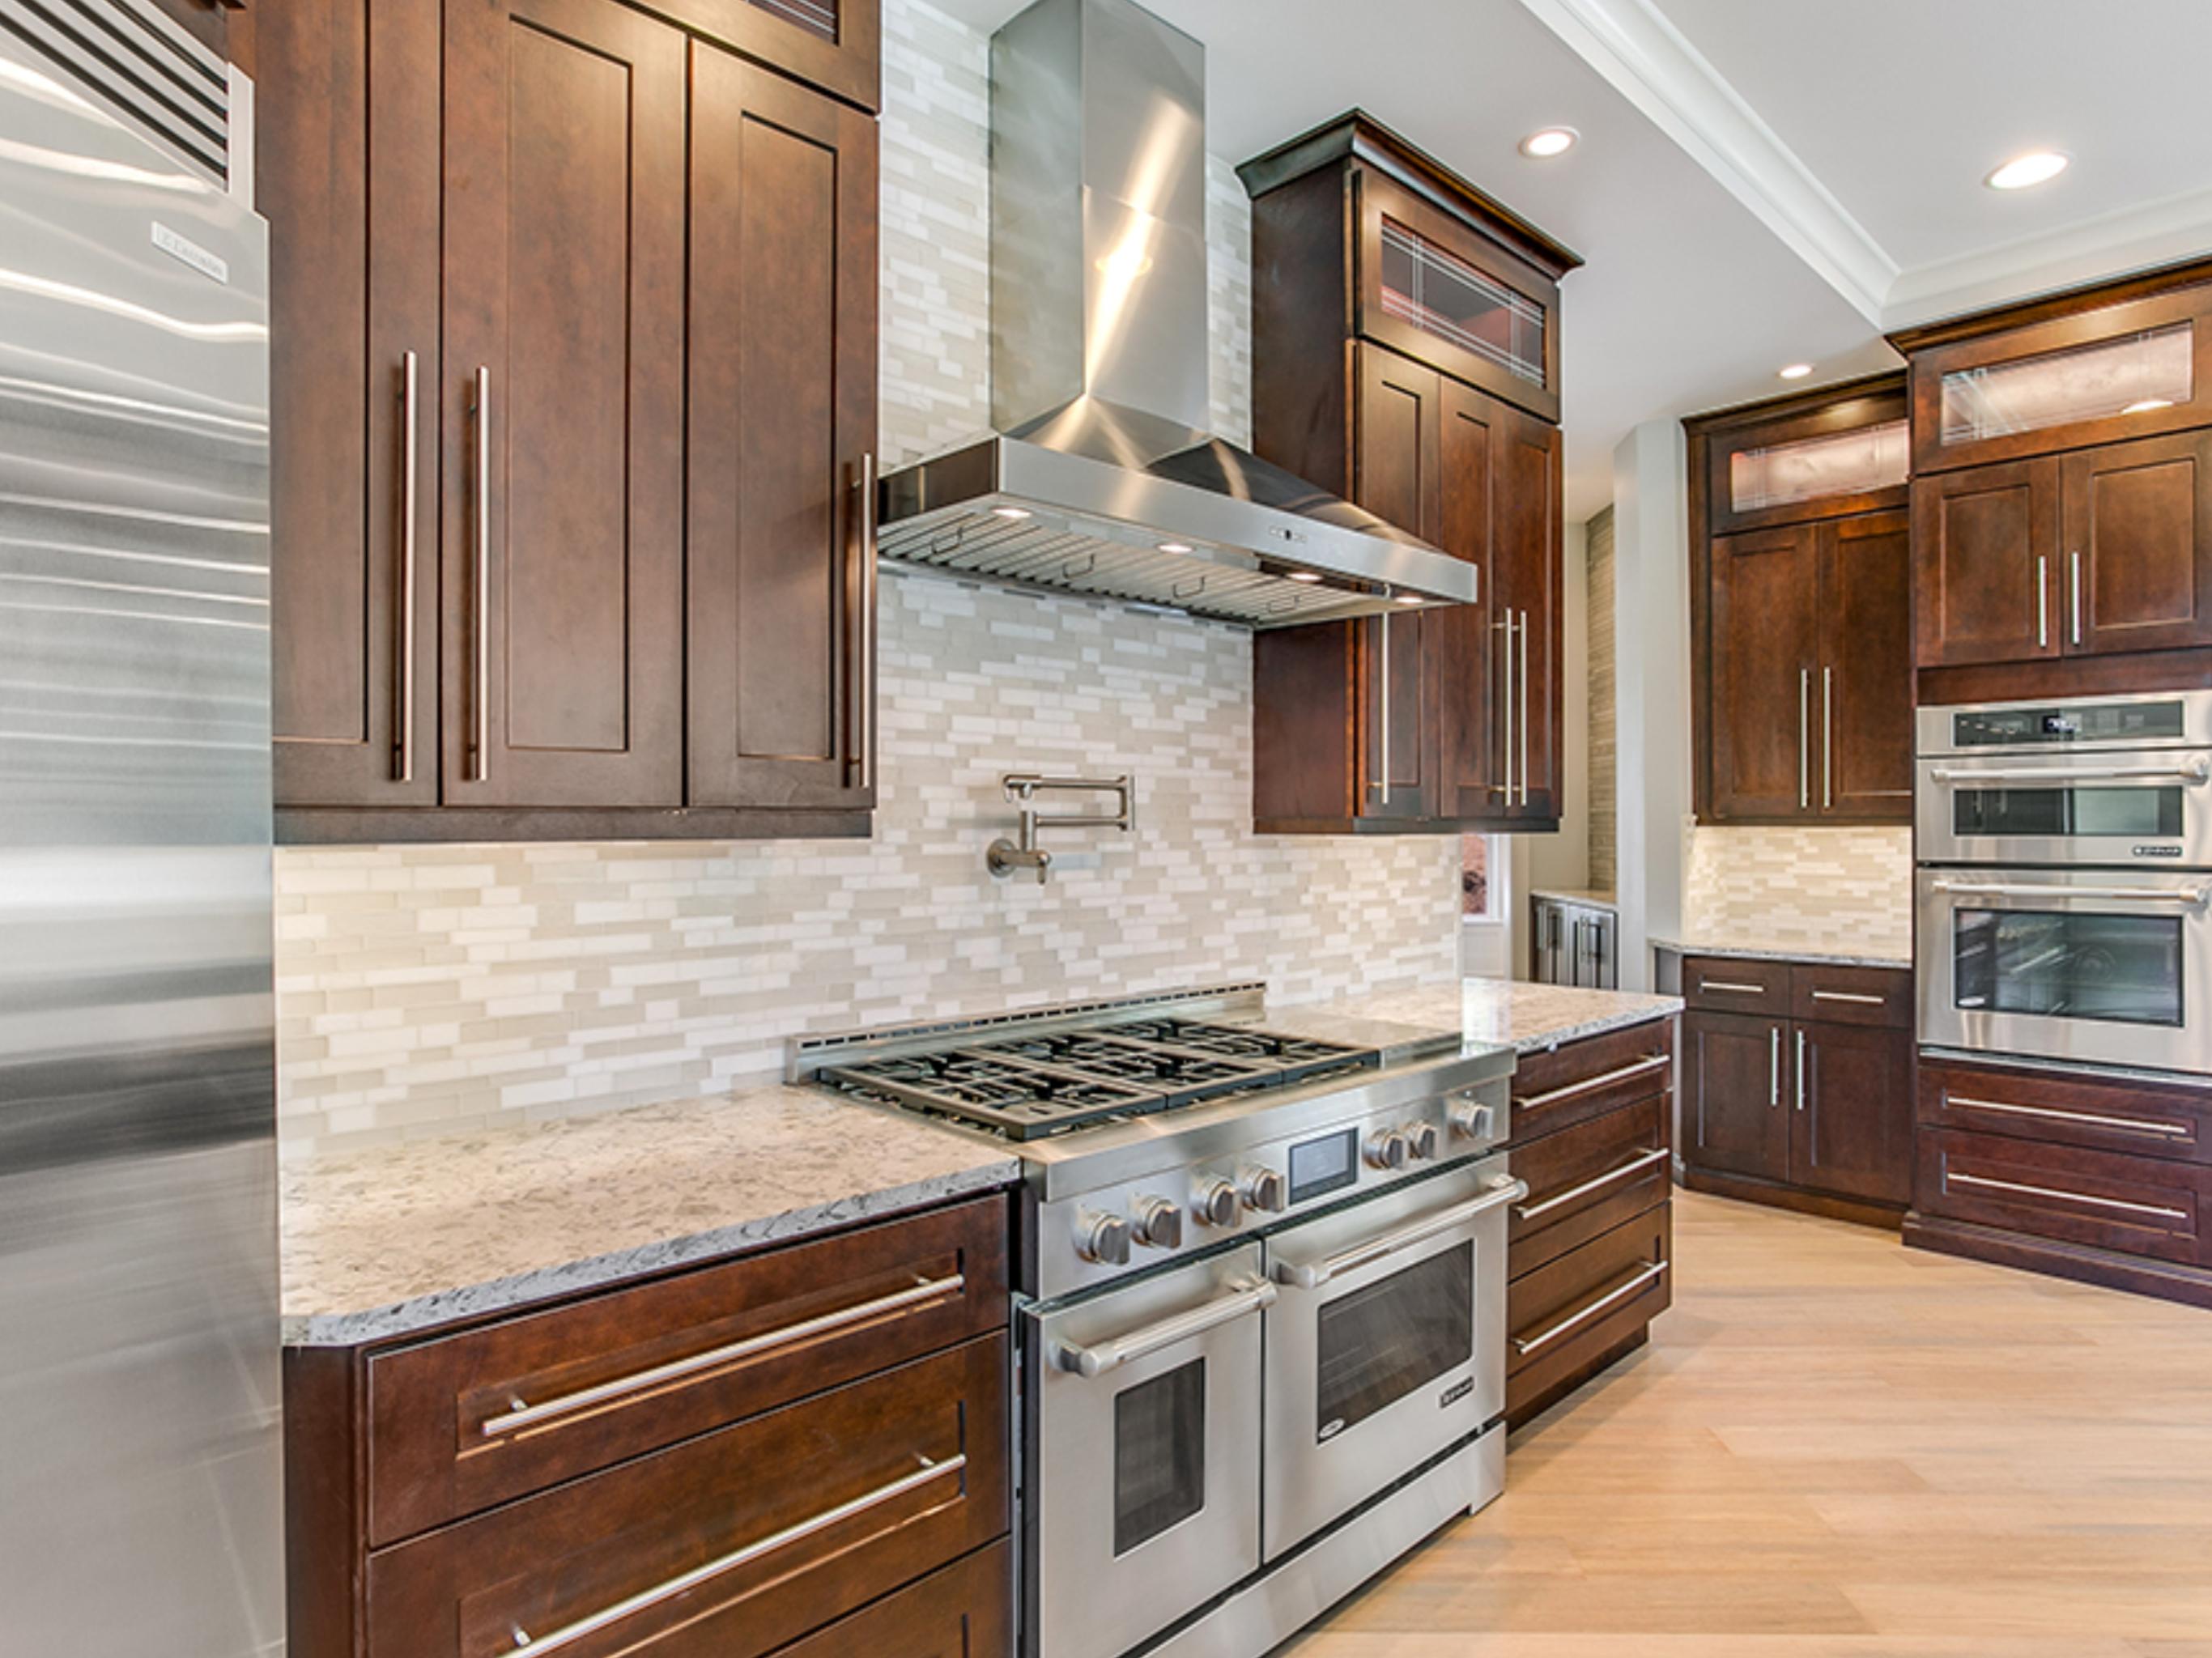 Pin de abc kitchens en Java Coffee Maple Cabinets | Pinterest